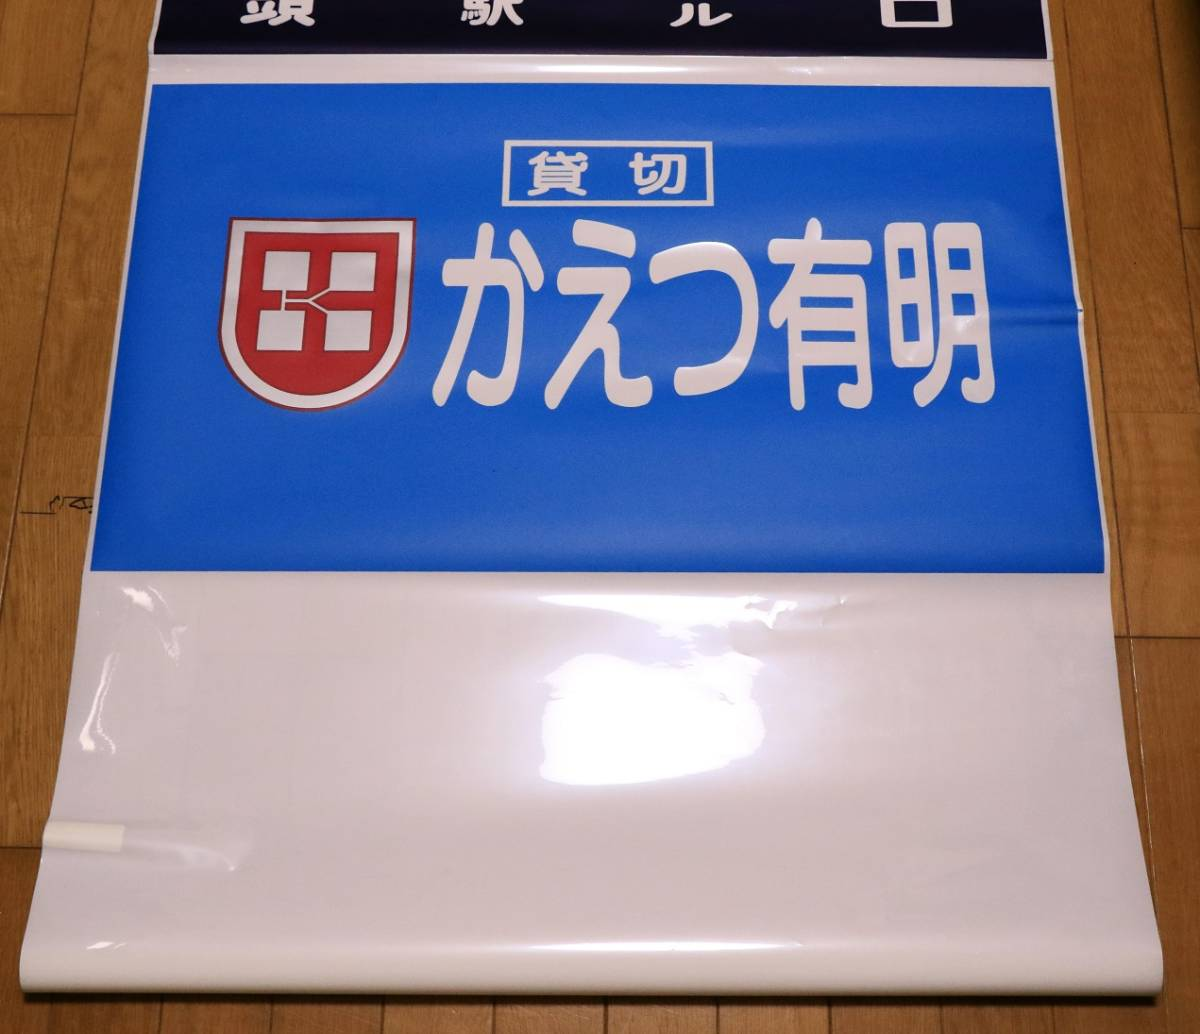 【都営バス】深川営業所・側面方向幕/98コマ収録/H2.4~使用_画像10